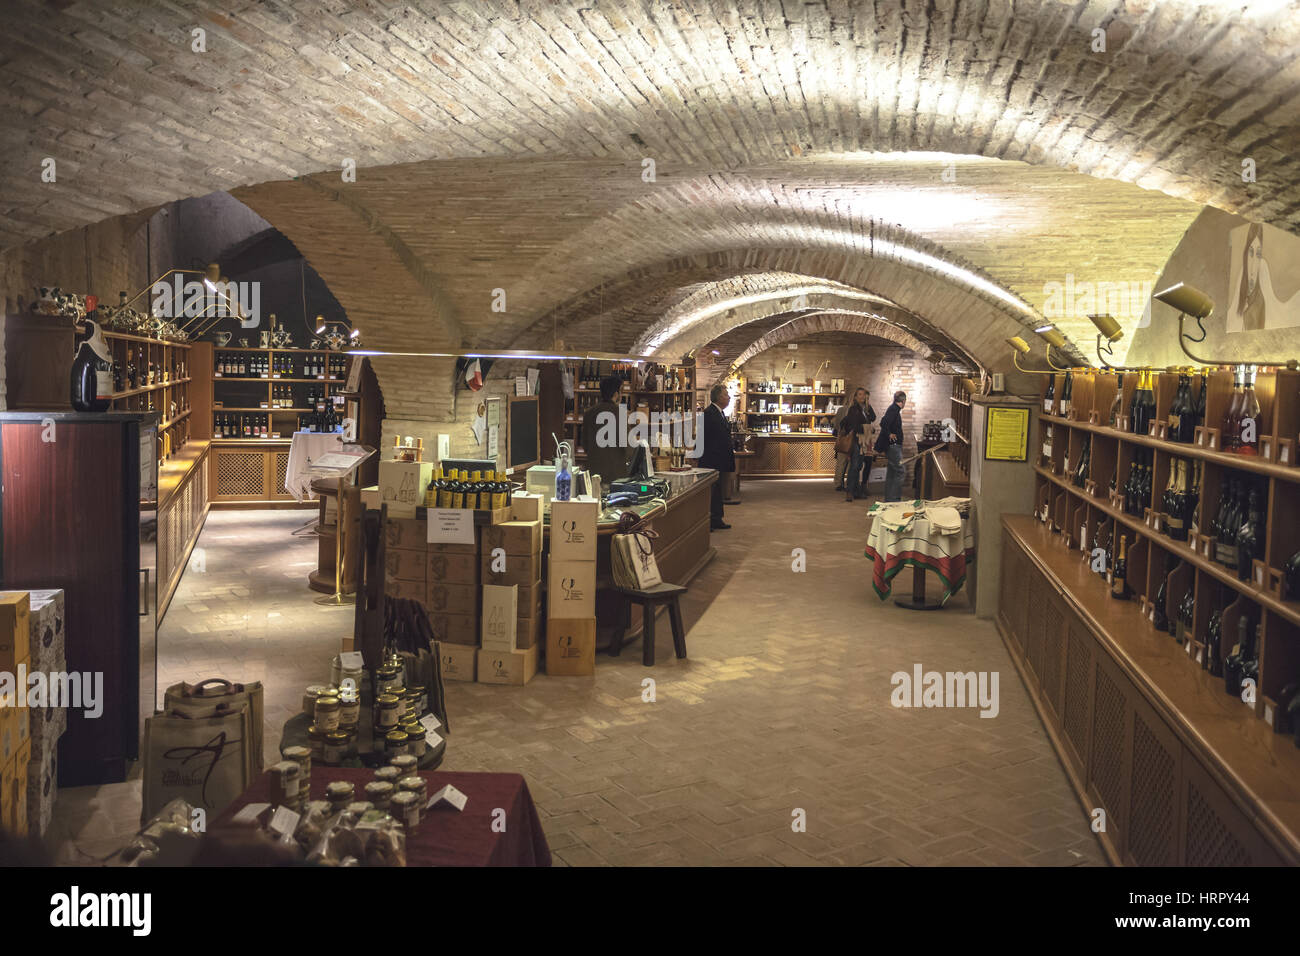 Dozza Stockfotos & Dozza Bilder - Alamy